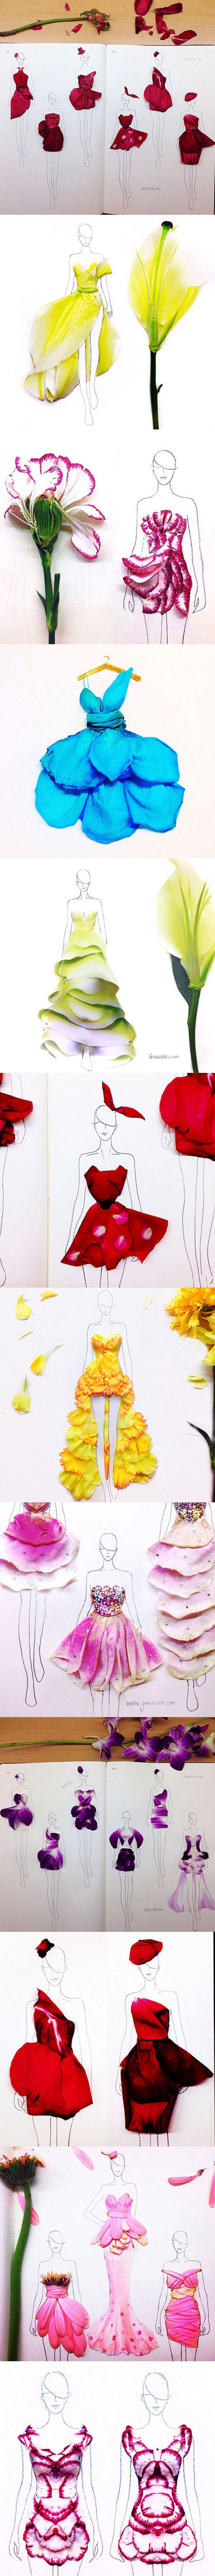 clothes-fashion-illustration-rose-petals